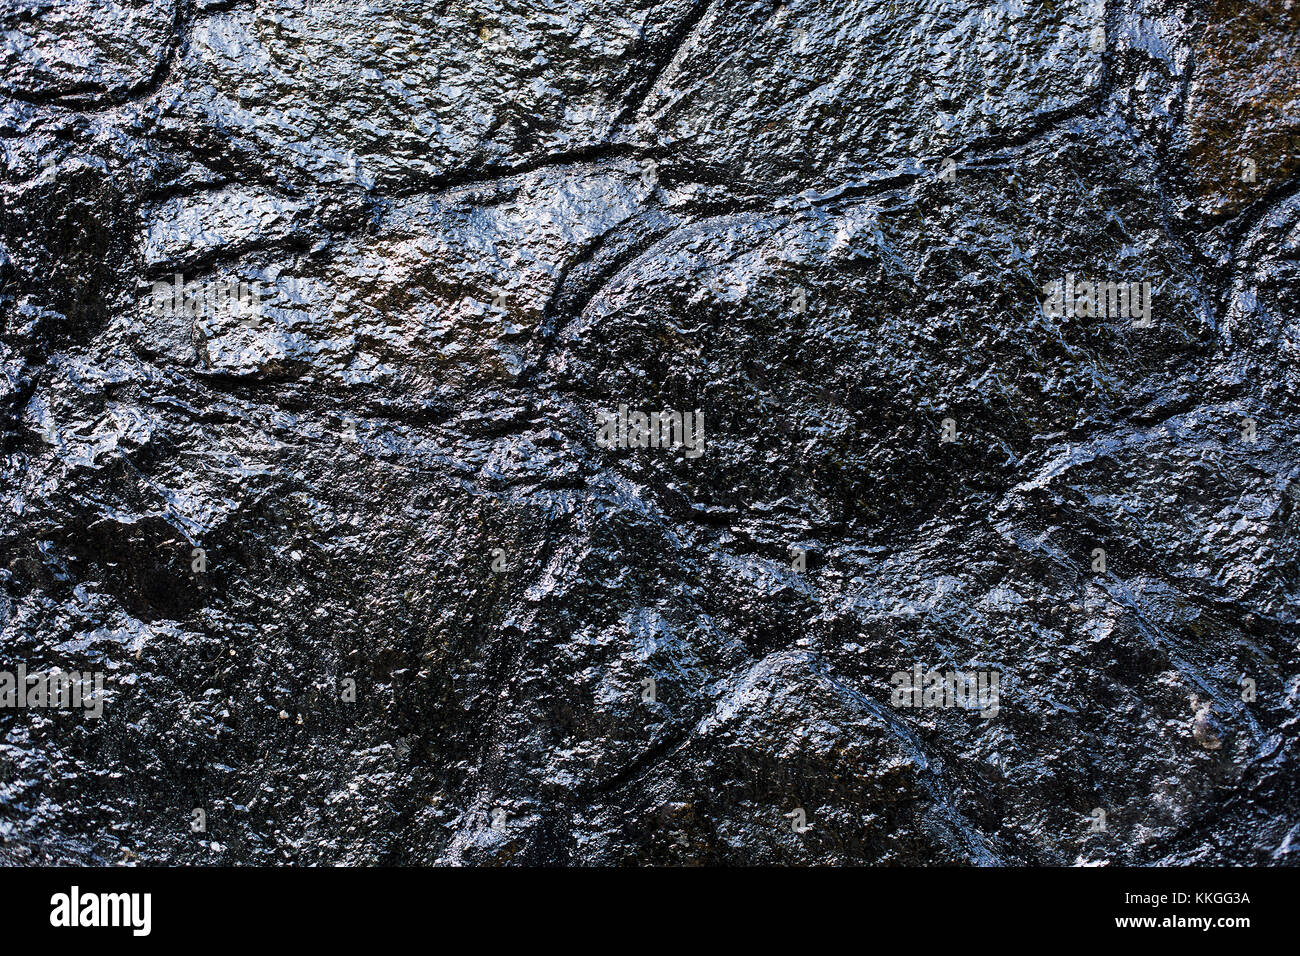 black stone wall texture gray wall dark brick wall texture of black stone blocks high resolution panorama background